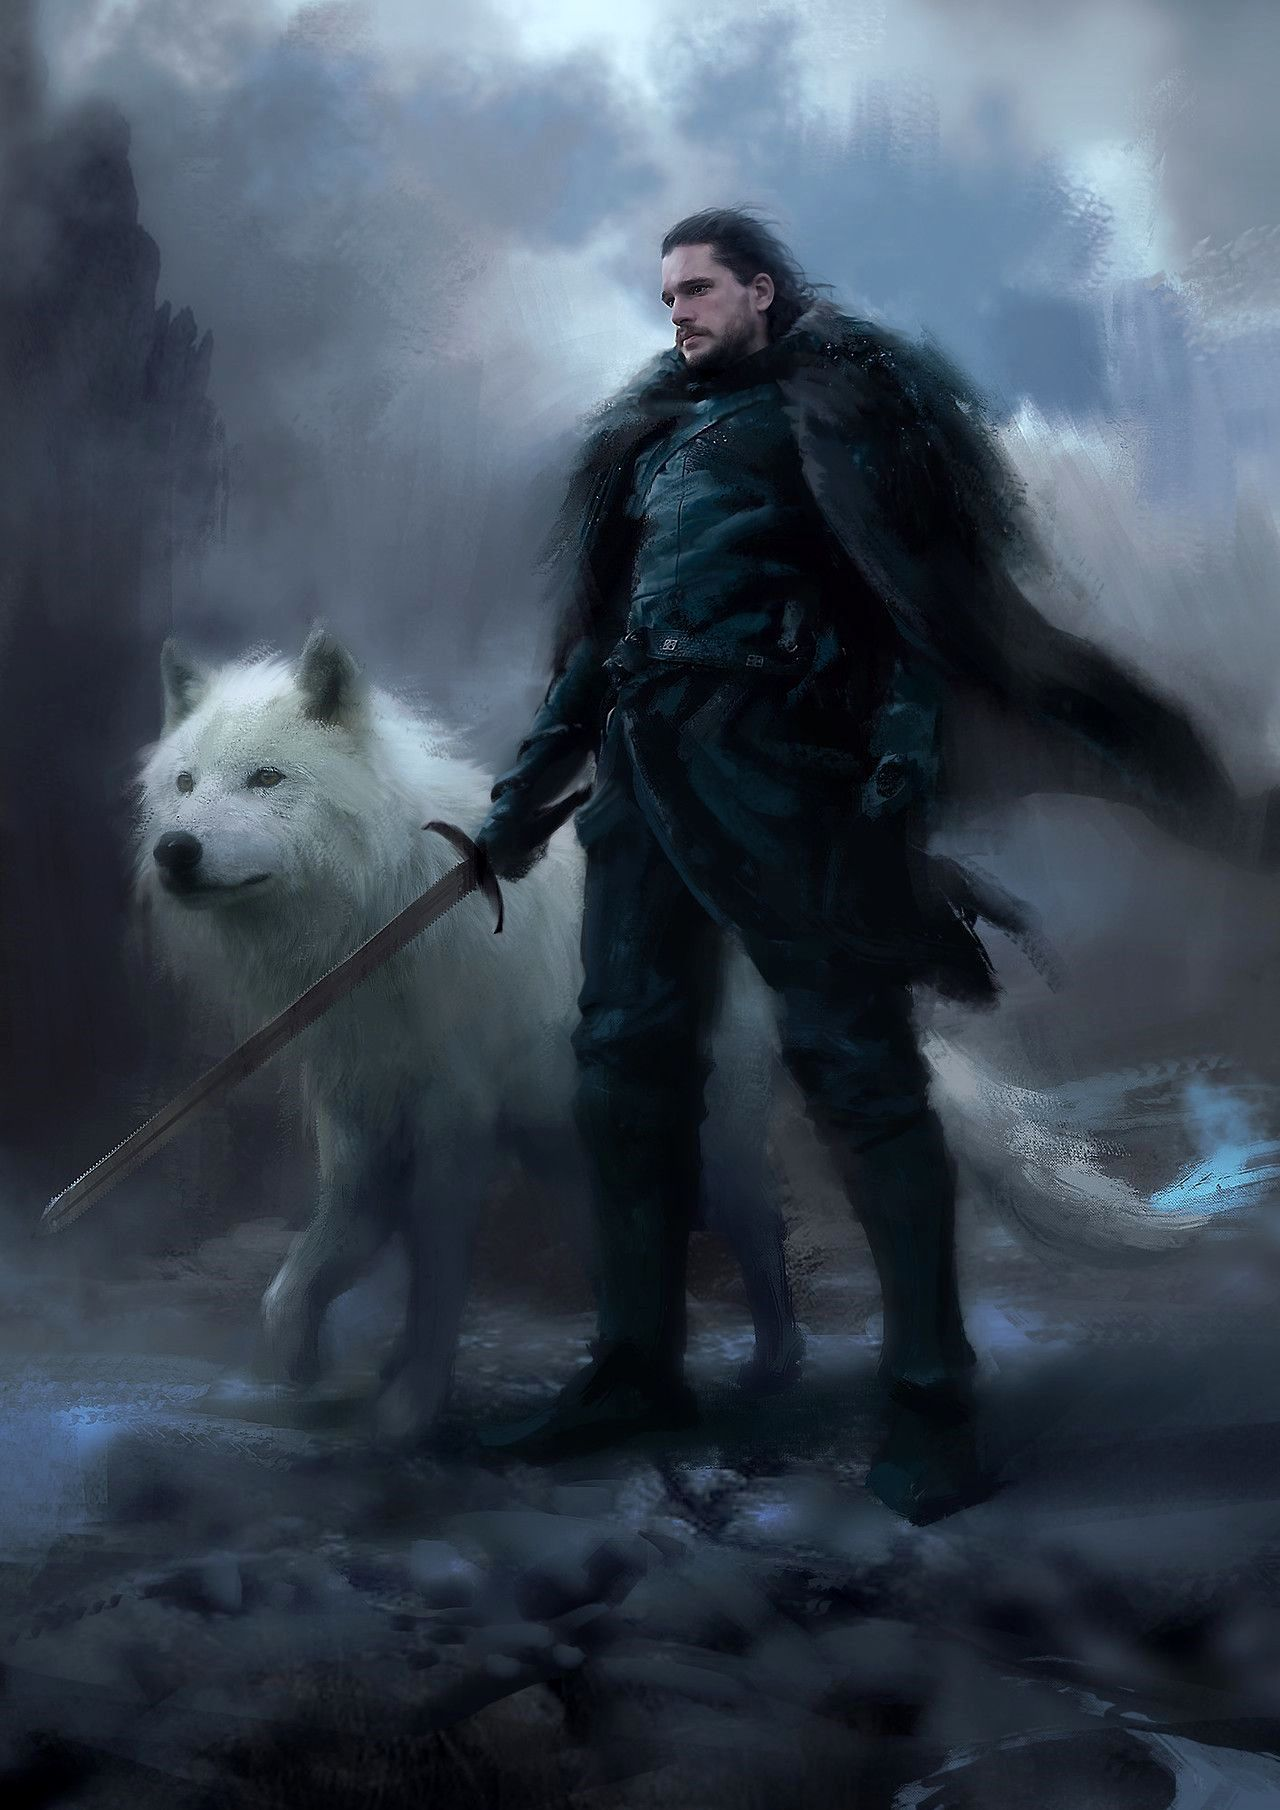 Wallpaper 4k Jon Snow Trick King In The North Jon Snow Art Jon Snow Jon snow game of thrones wallpaper